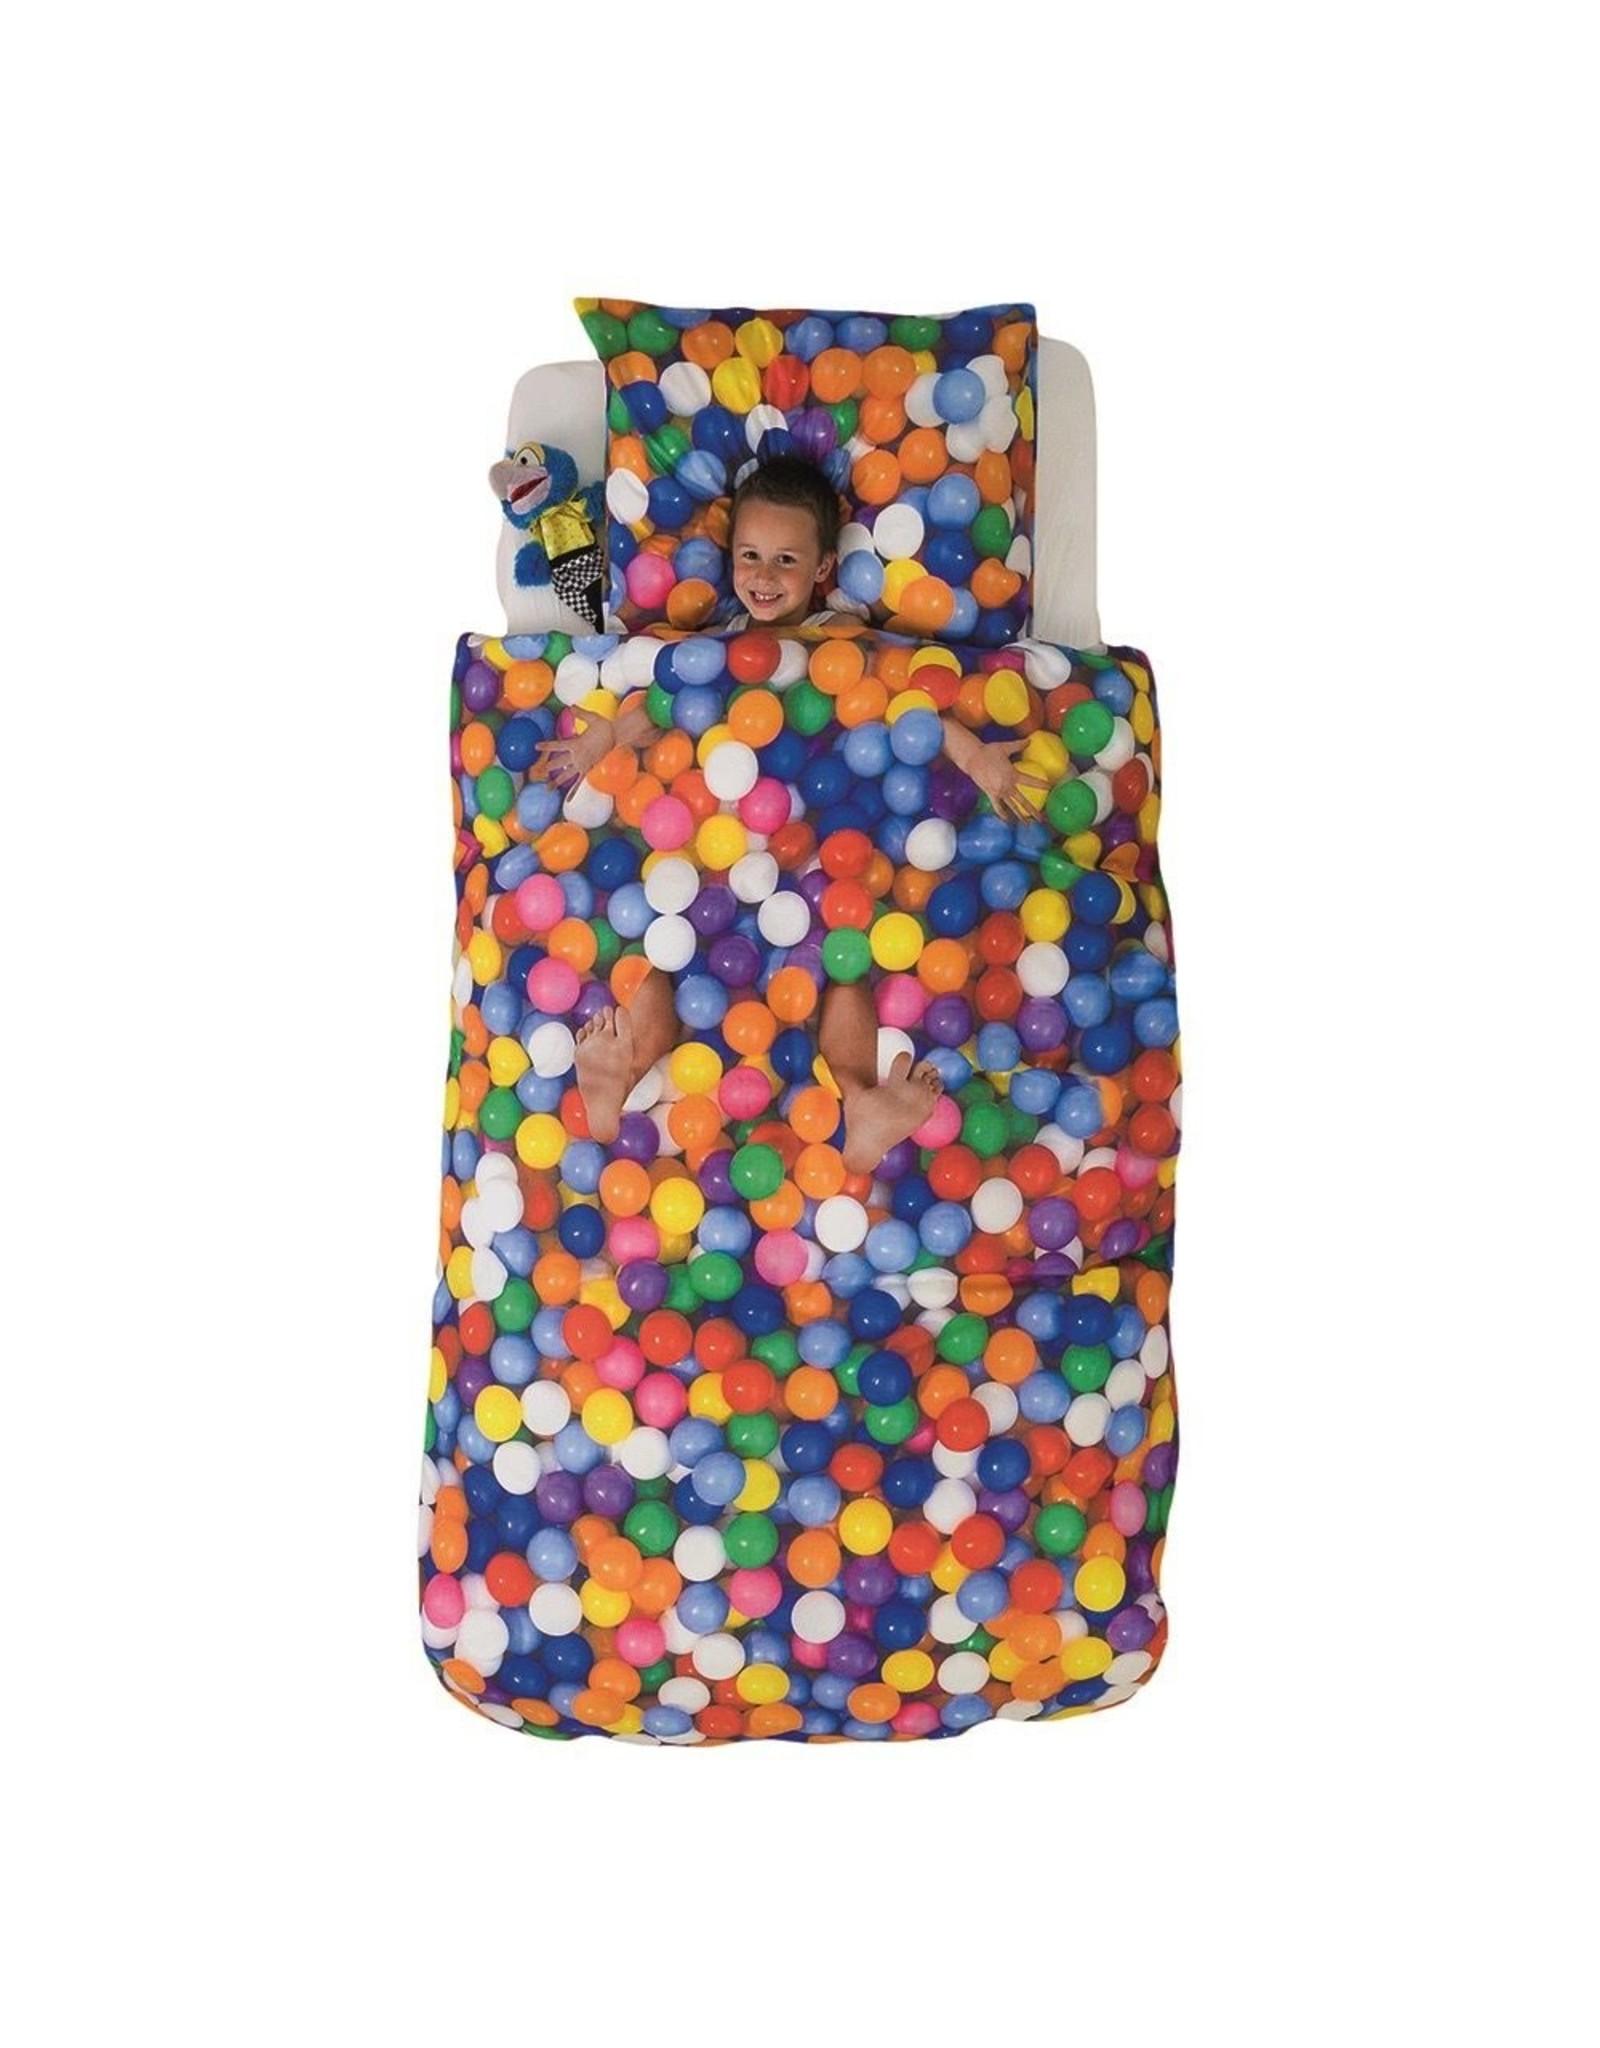 Snurk Ball Pit